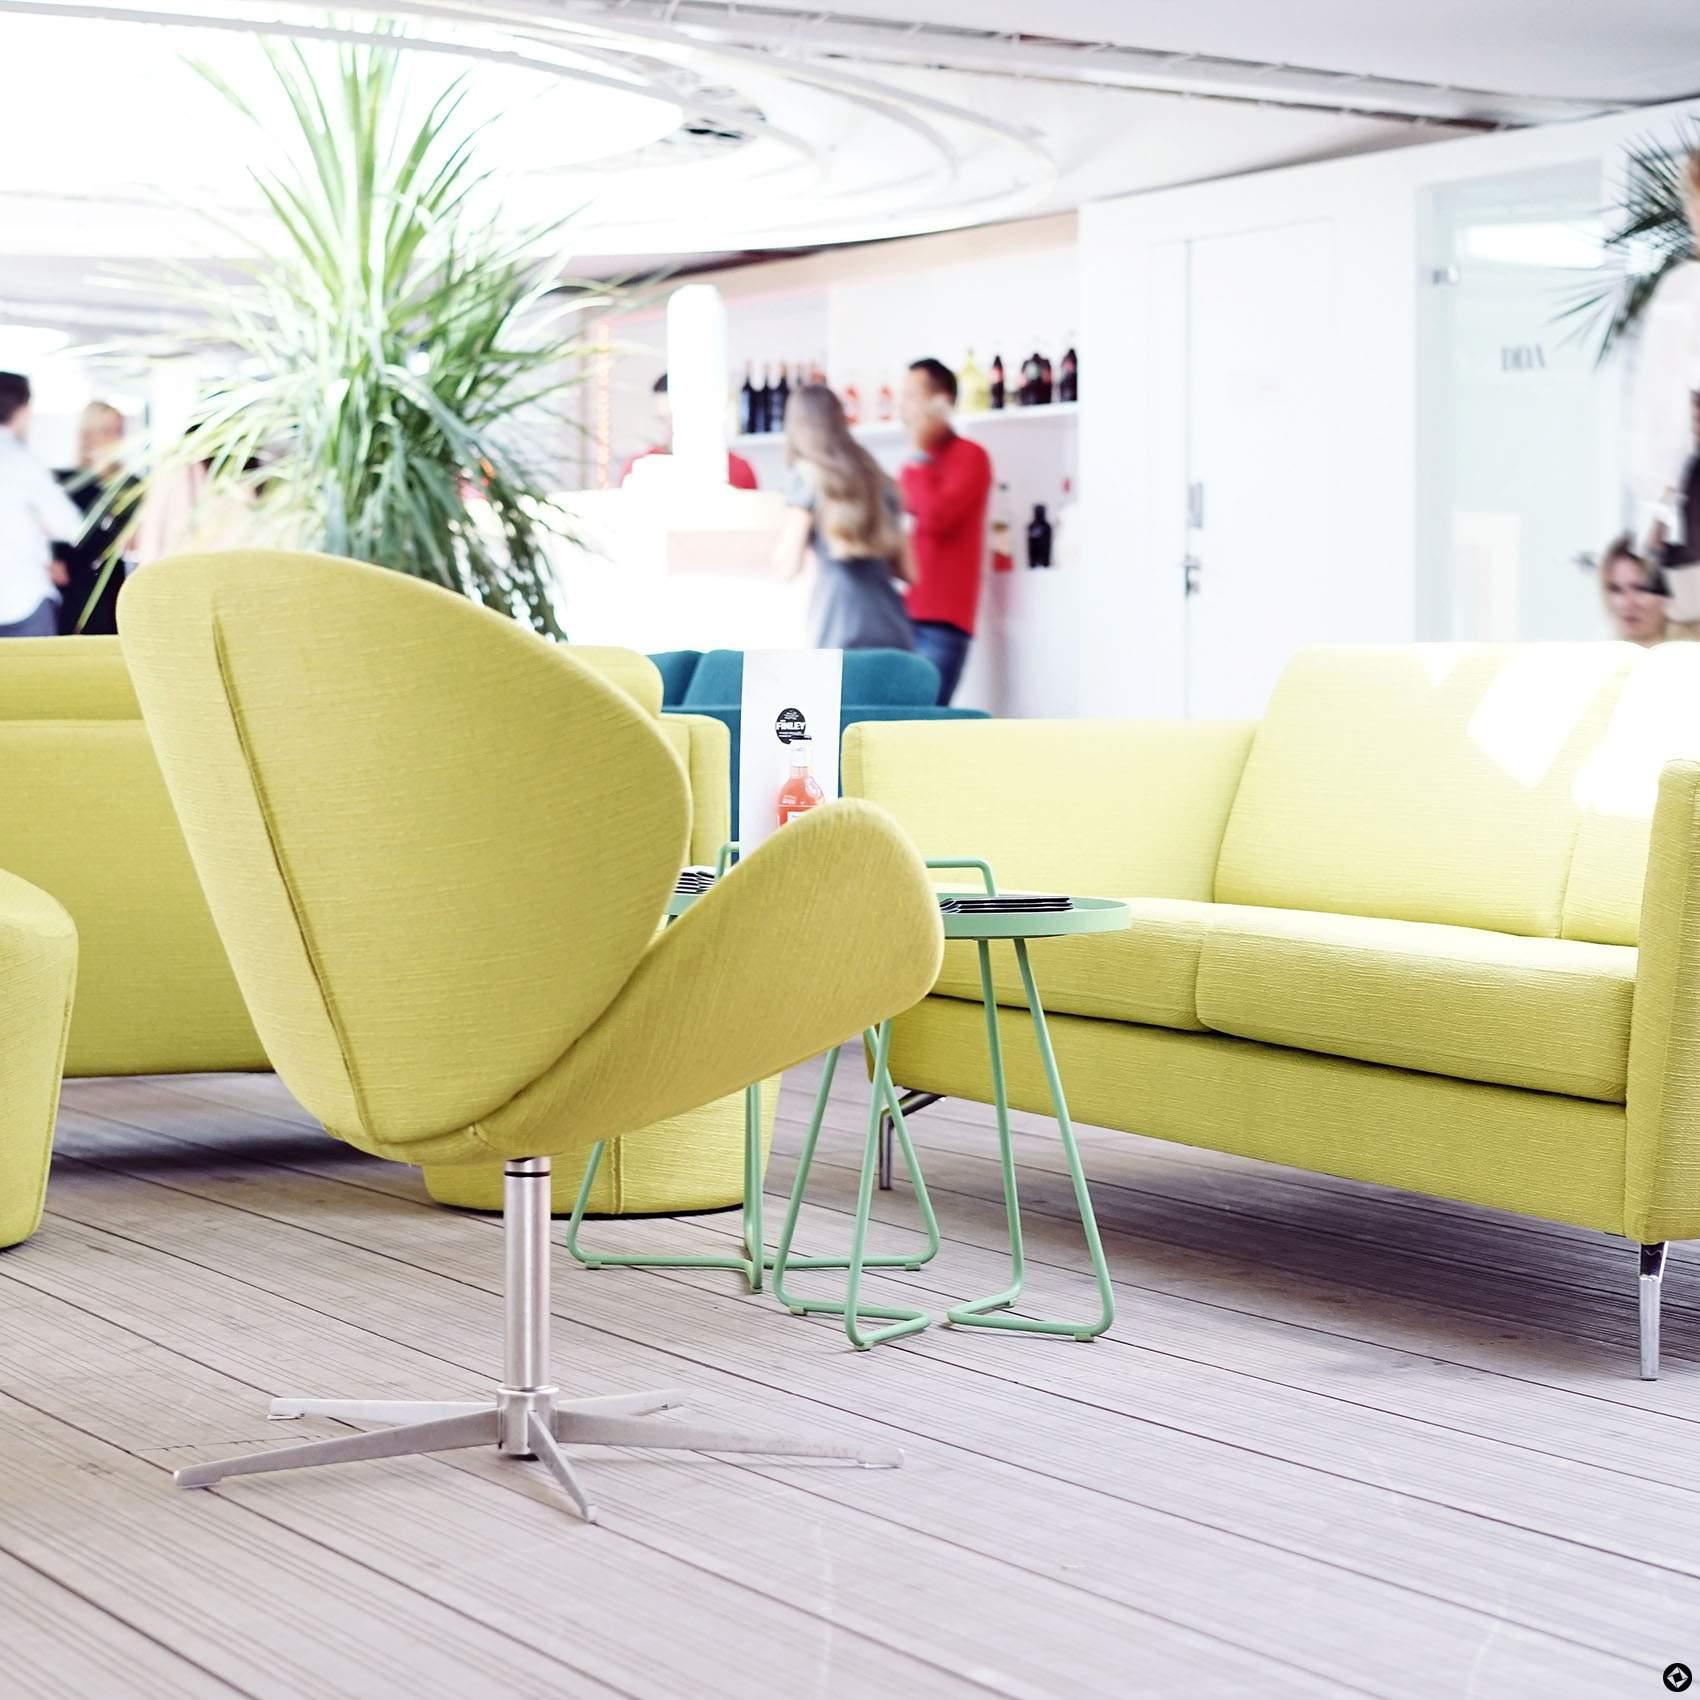 1000 images about boconcept around the world on pinterest boconcept interior design services. Black Bedroom Furniture Sets. Home Design Ideas